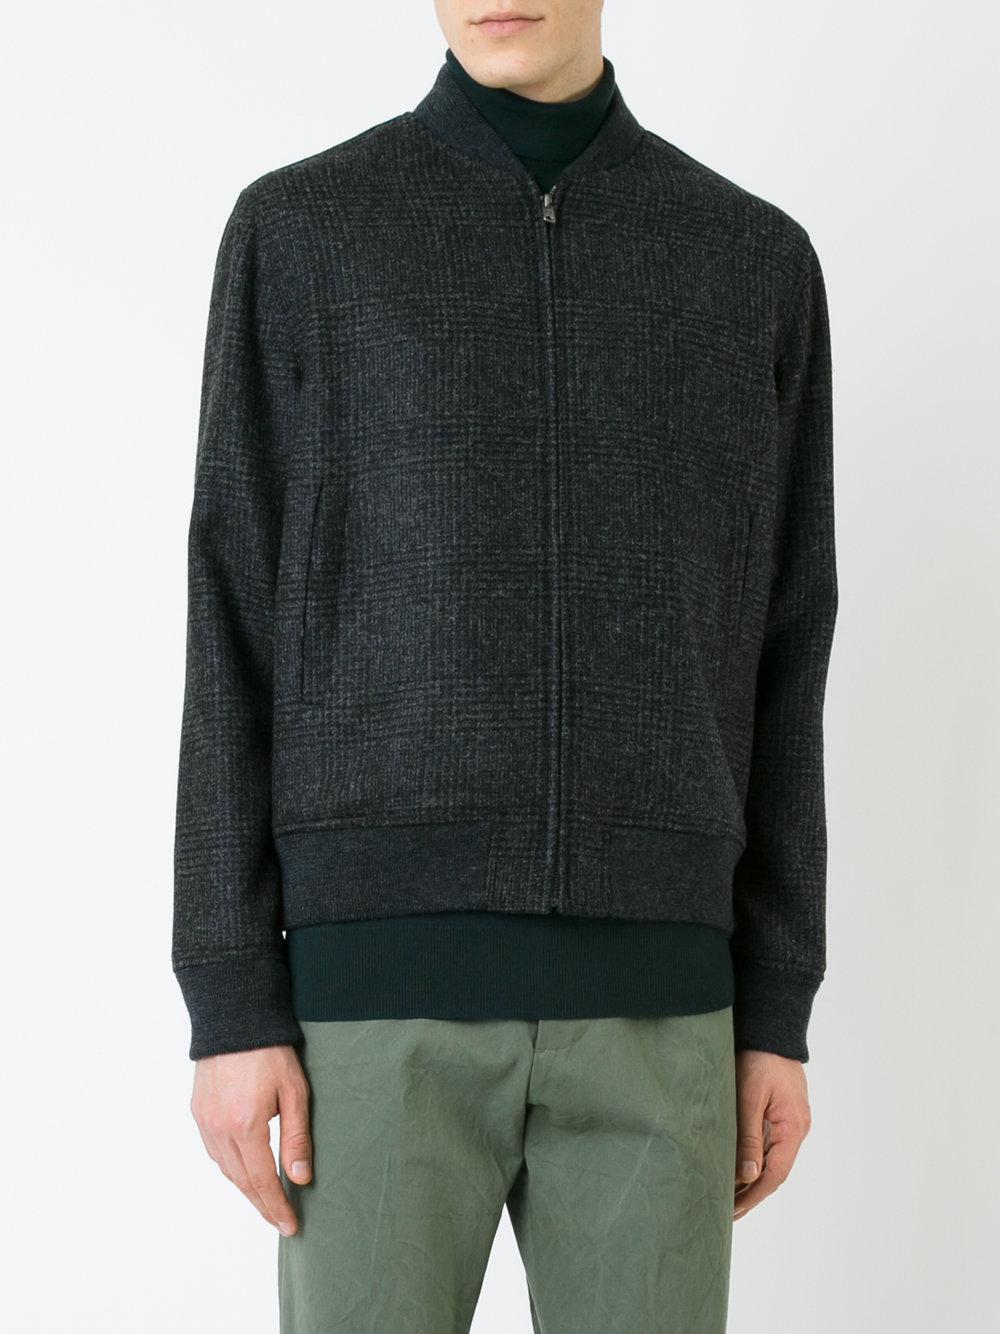 Kent & Curwen Tweed Bomber Jacket in Grey (Grey) for Men